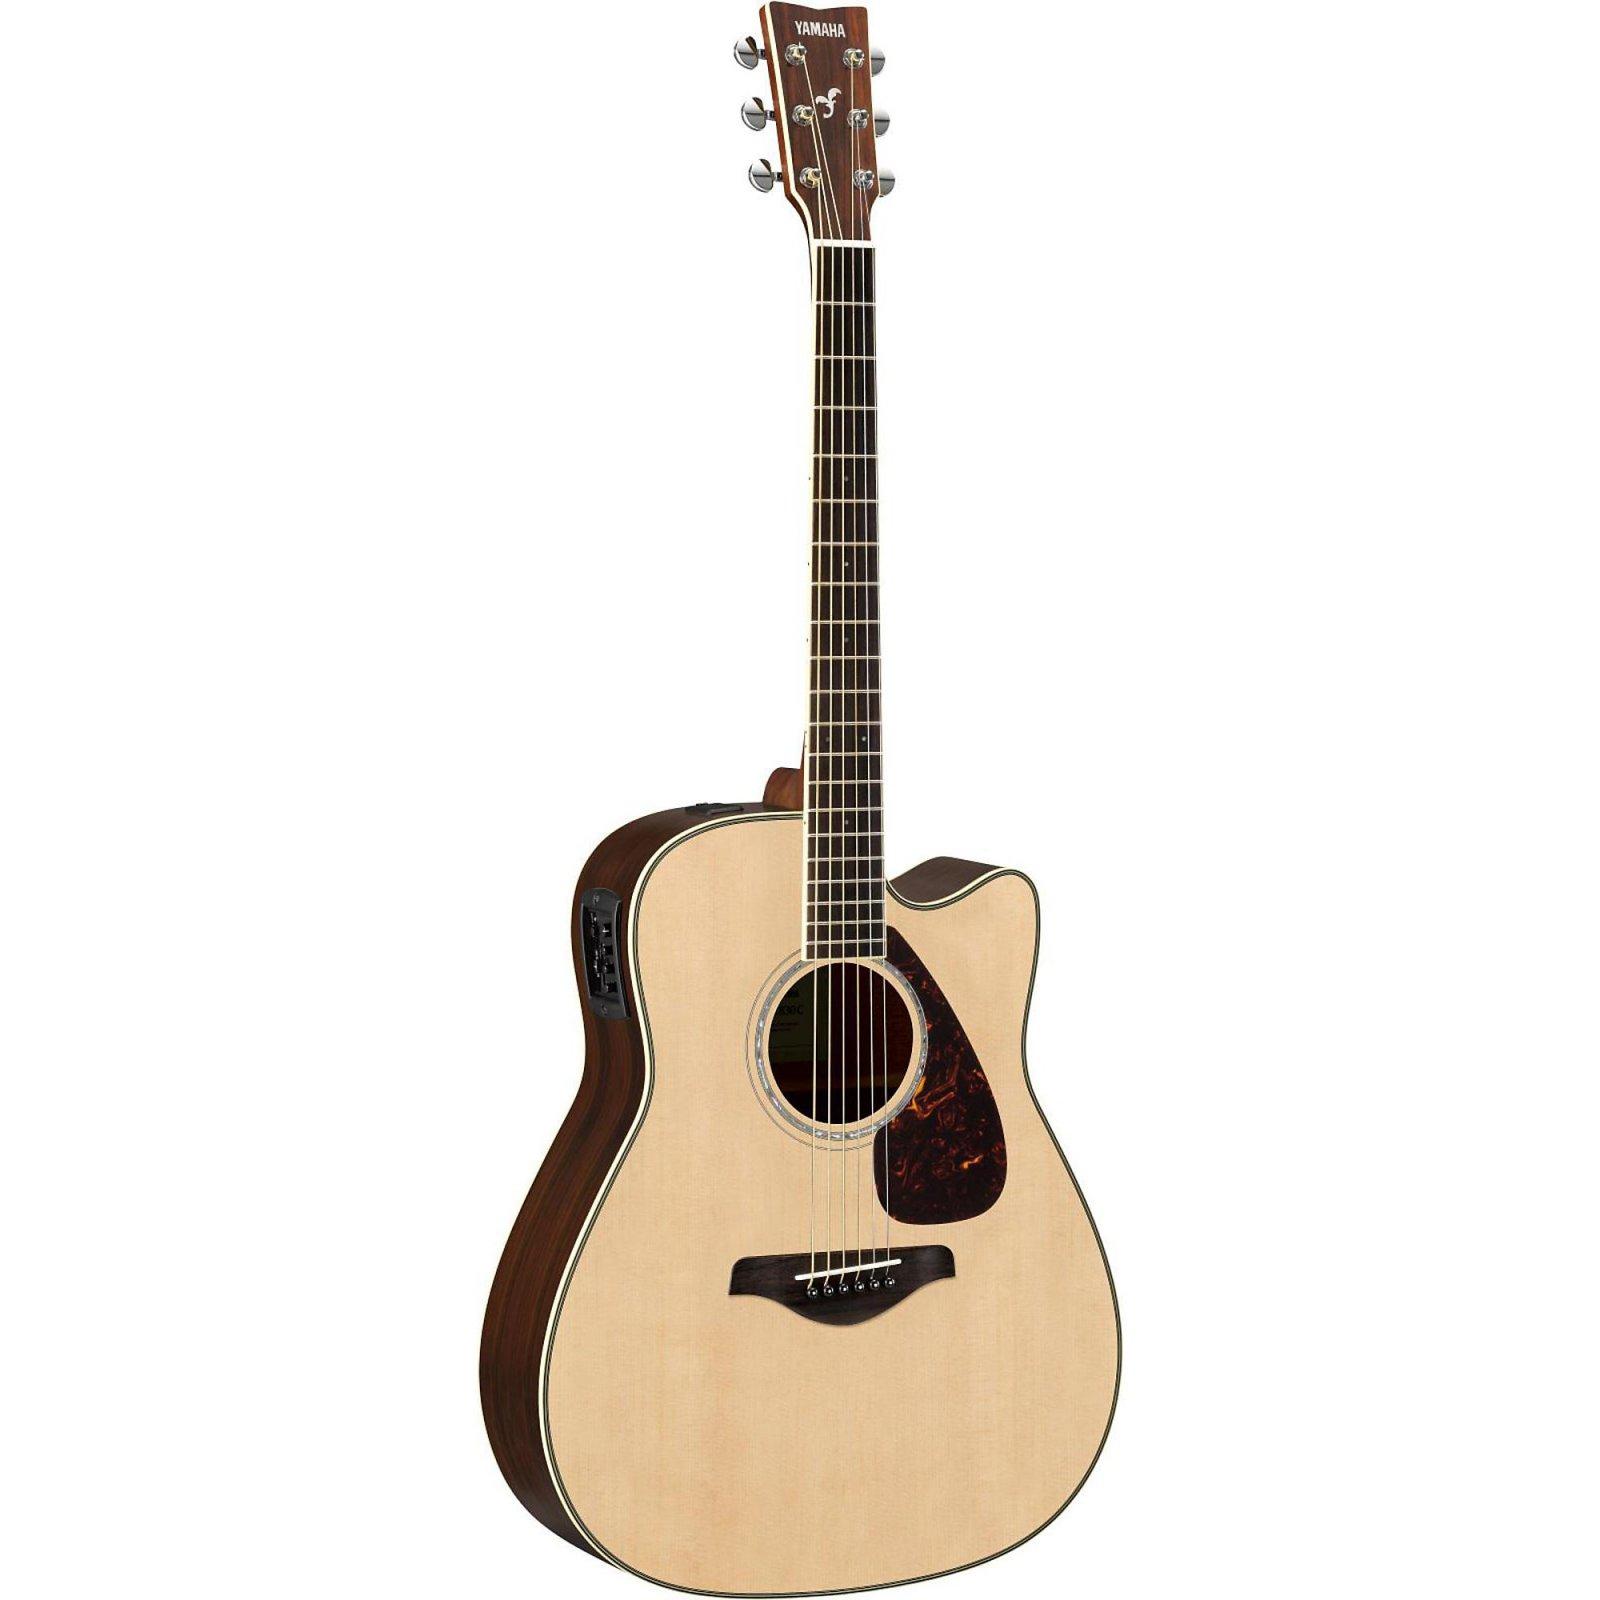 Yamaha FGX830C Acoustic/Electric Guitar-Natural